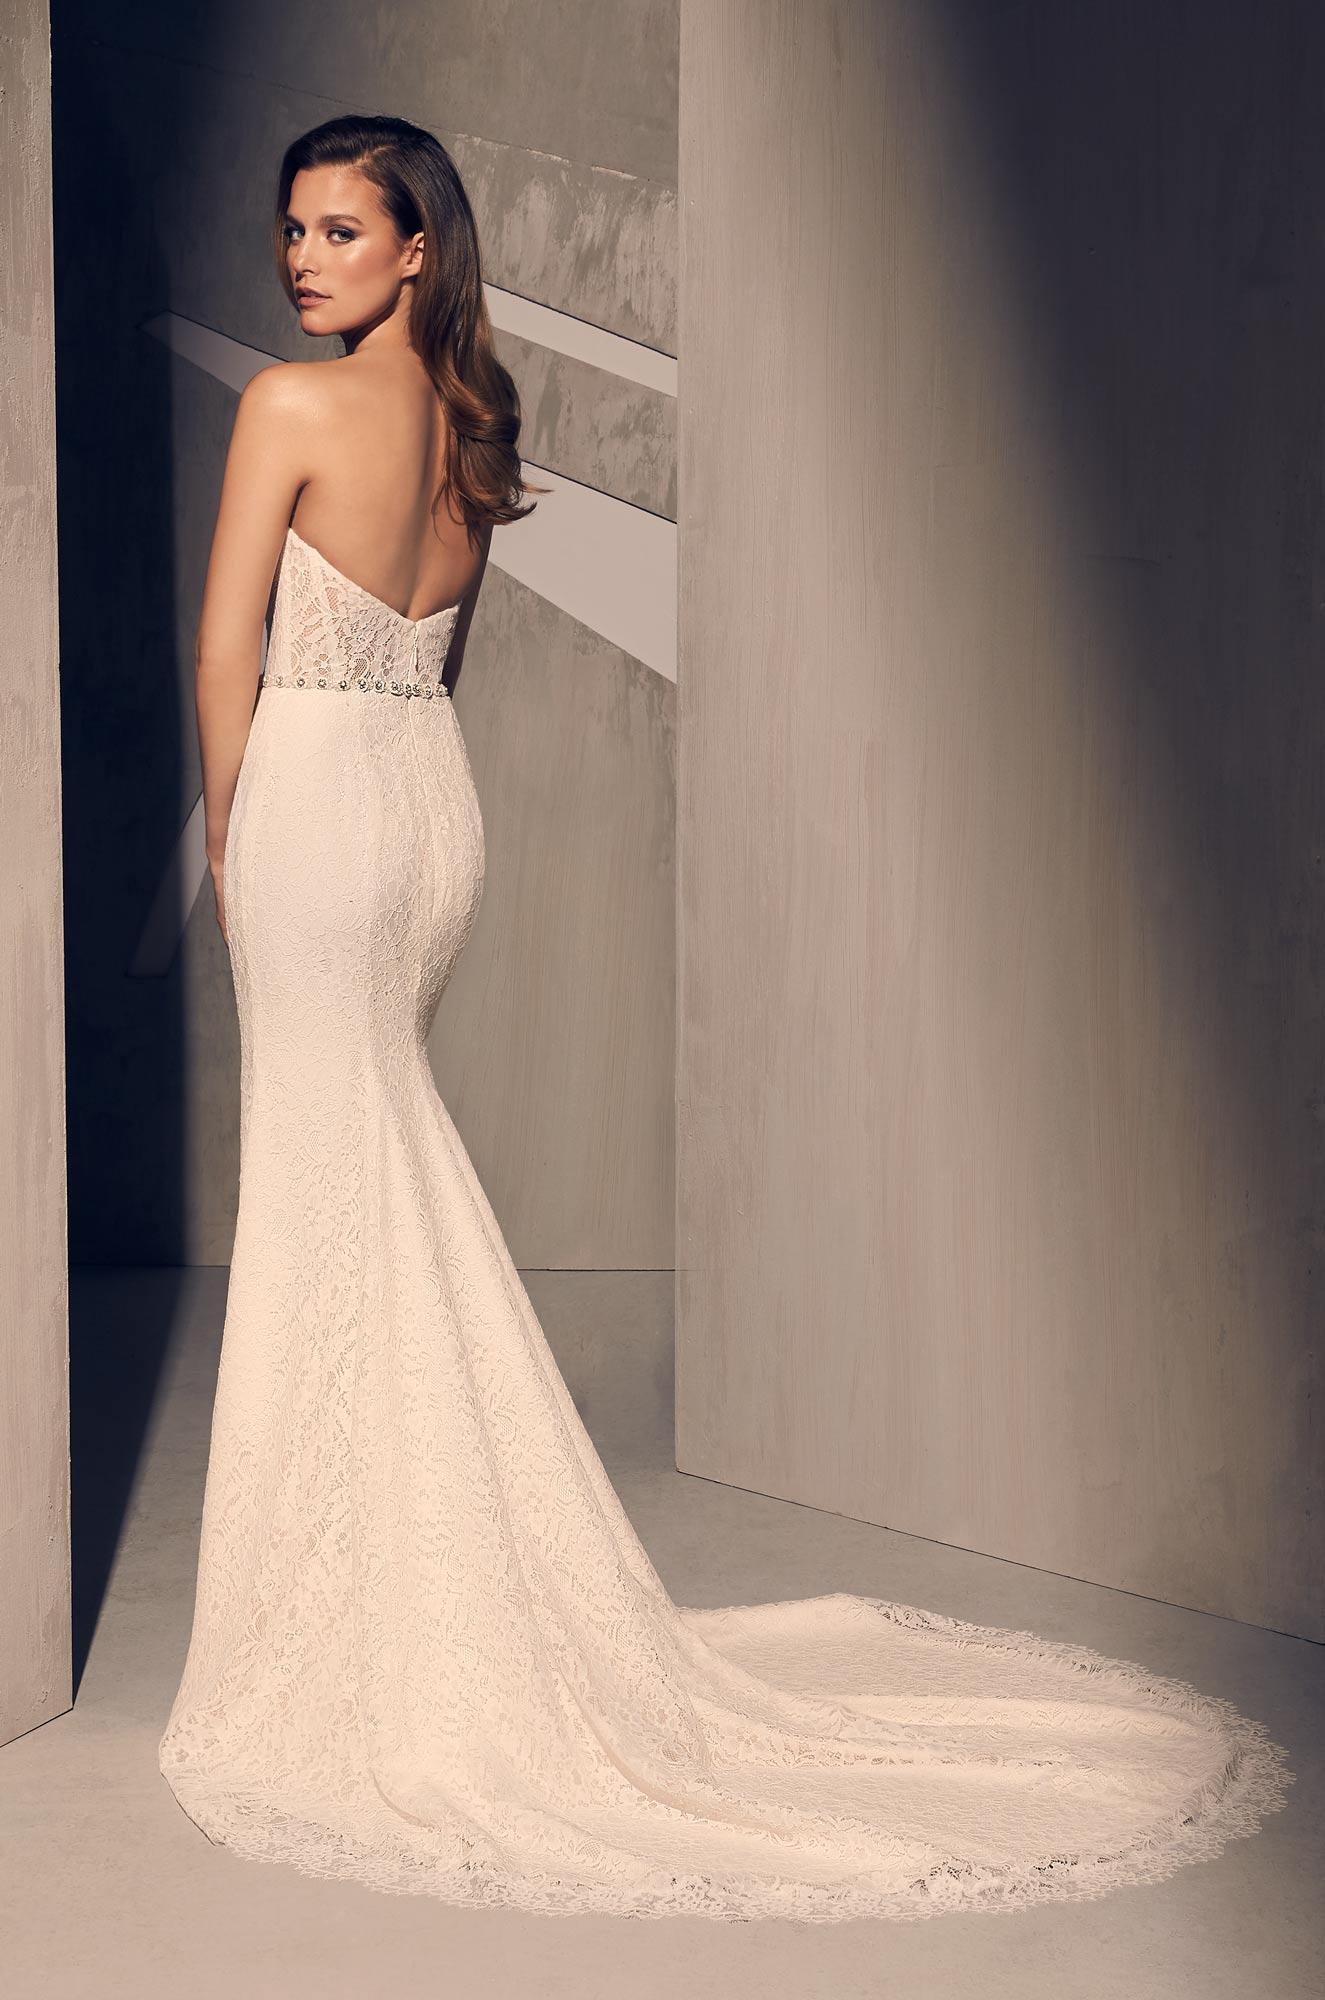 Sheer Corset Wedding Dress - Style #2209 | Mikaella Bridal